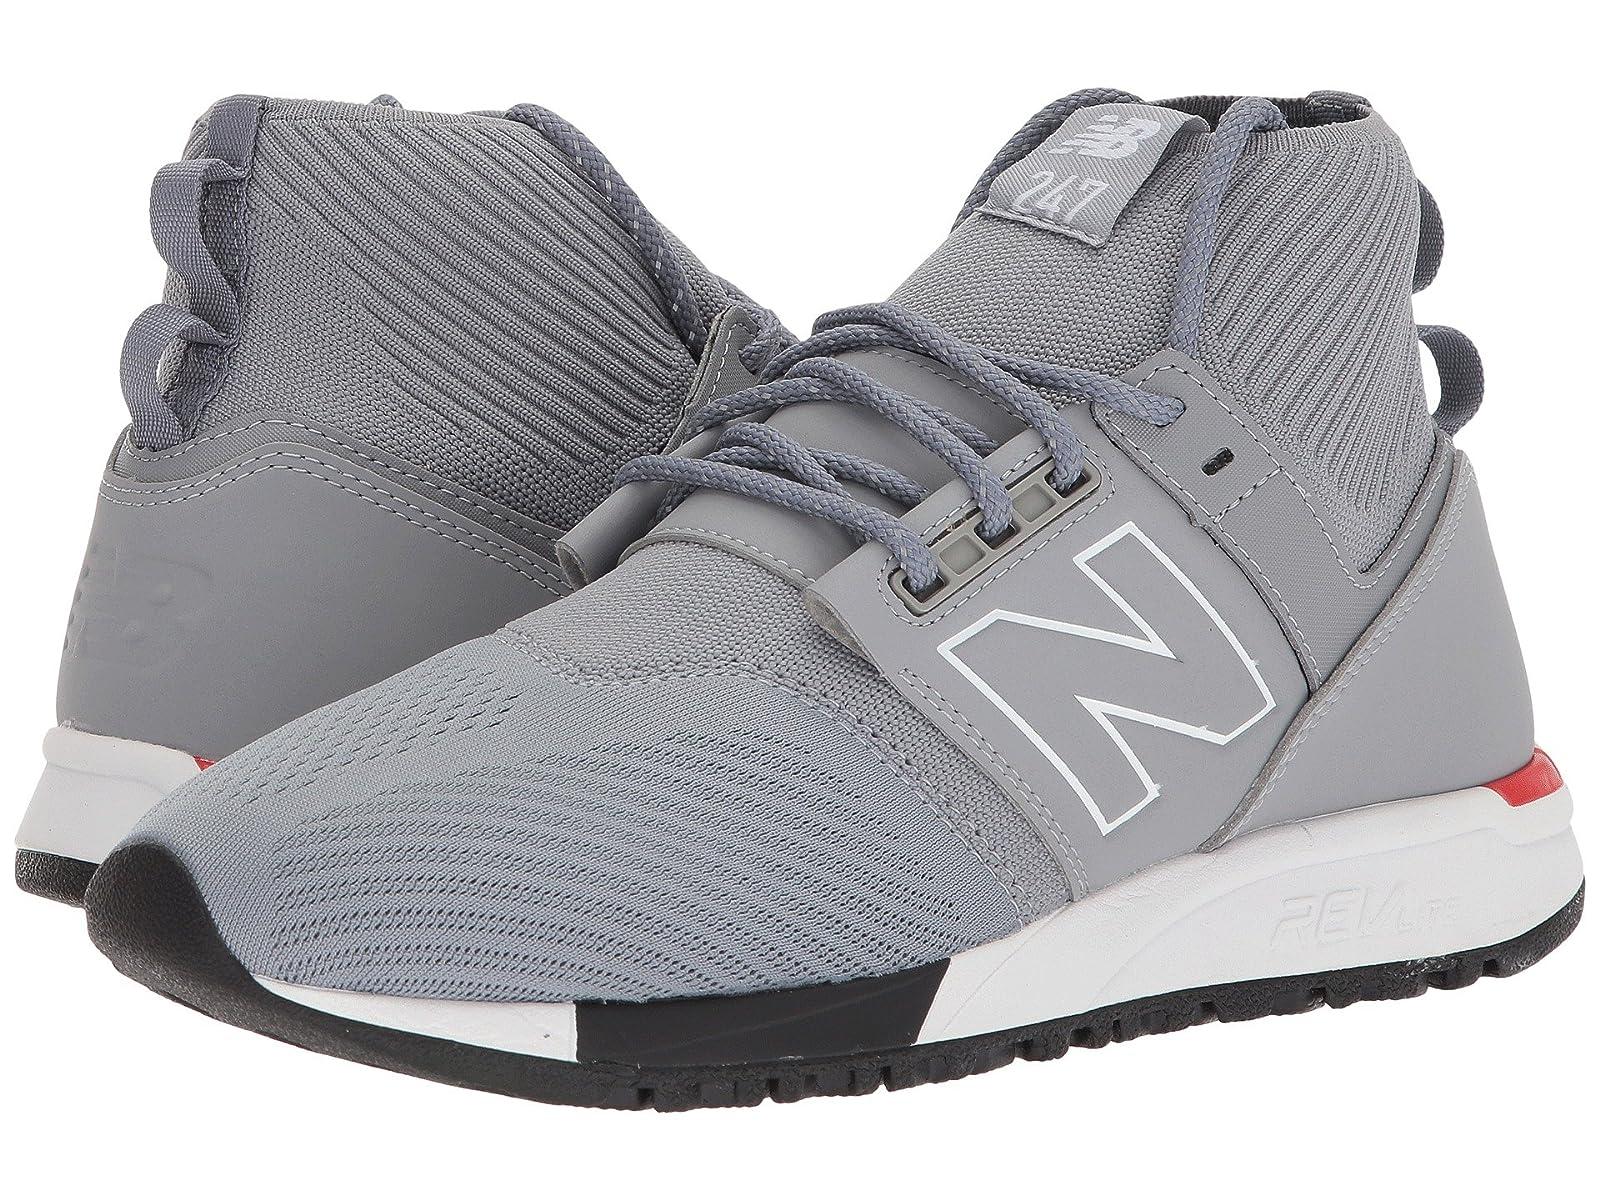 New Balance Classics MRL2401Cheap and distinctive eye-catching shoes